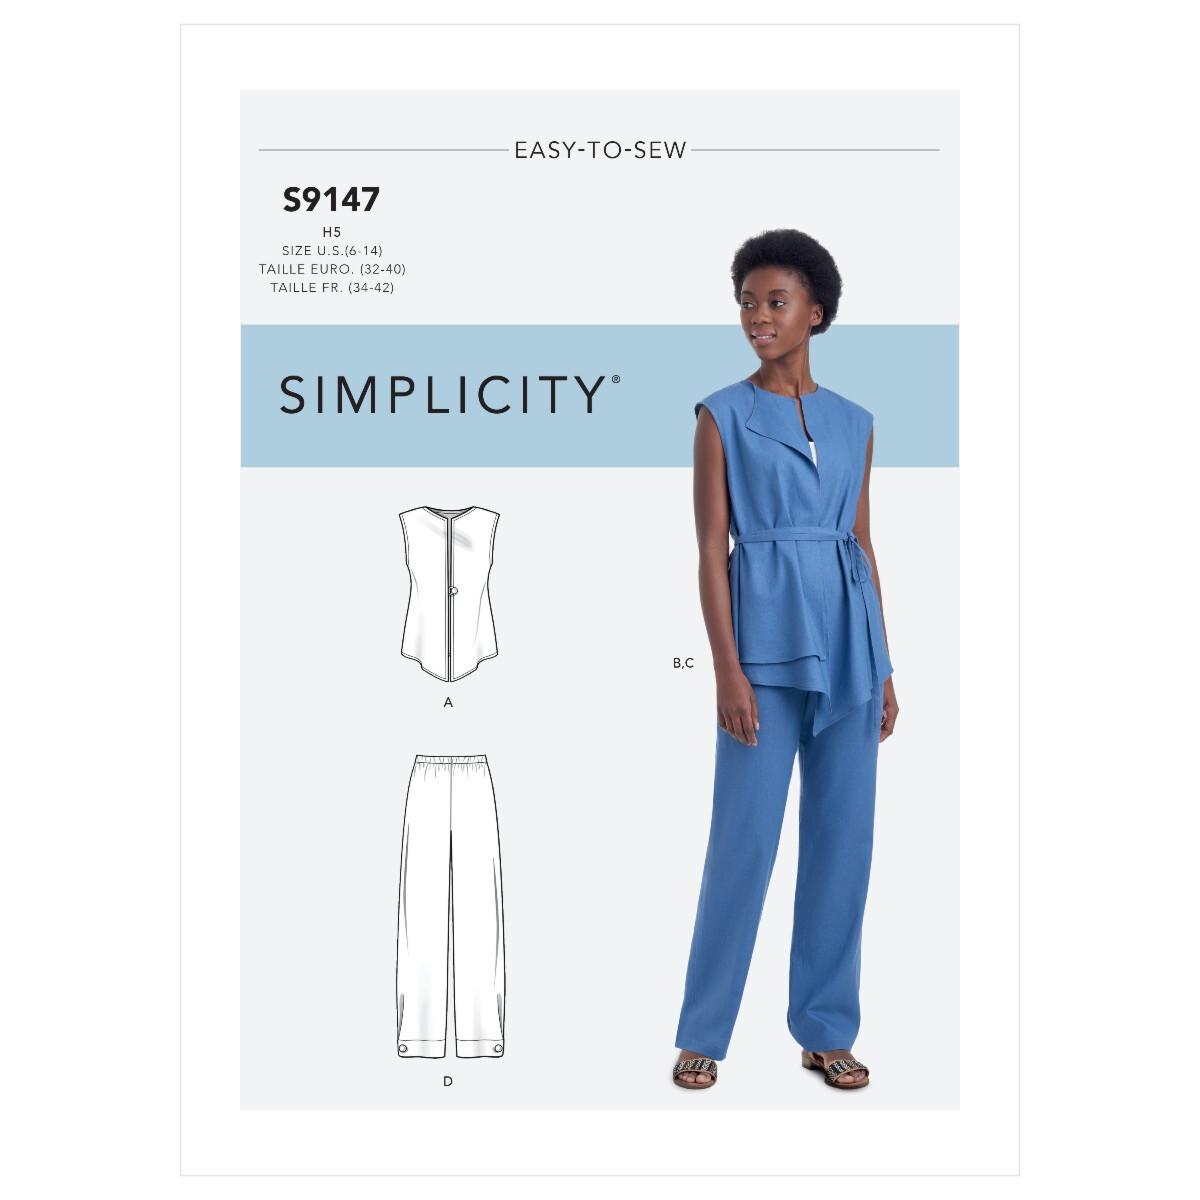 Simplicity - 9147